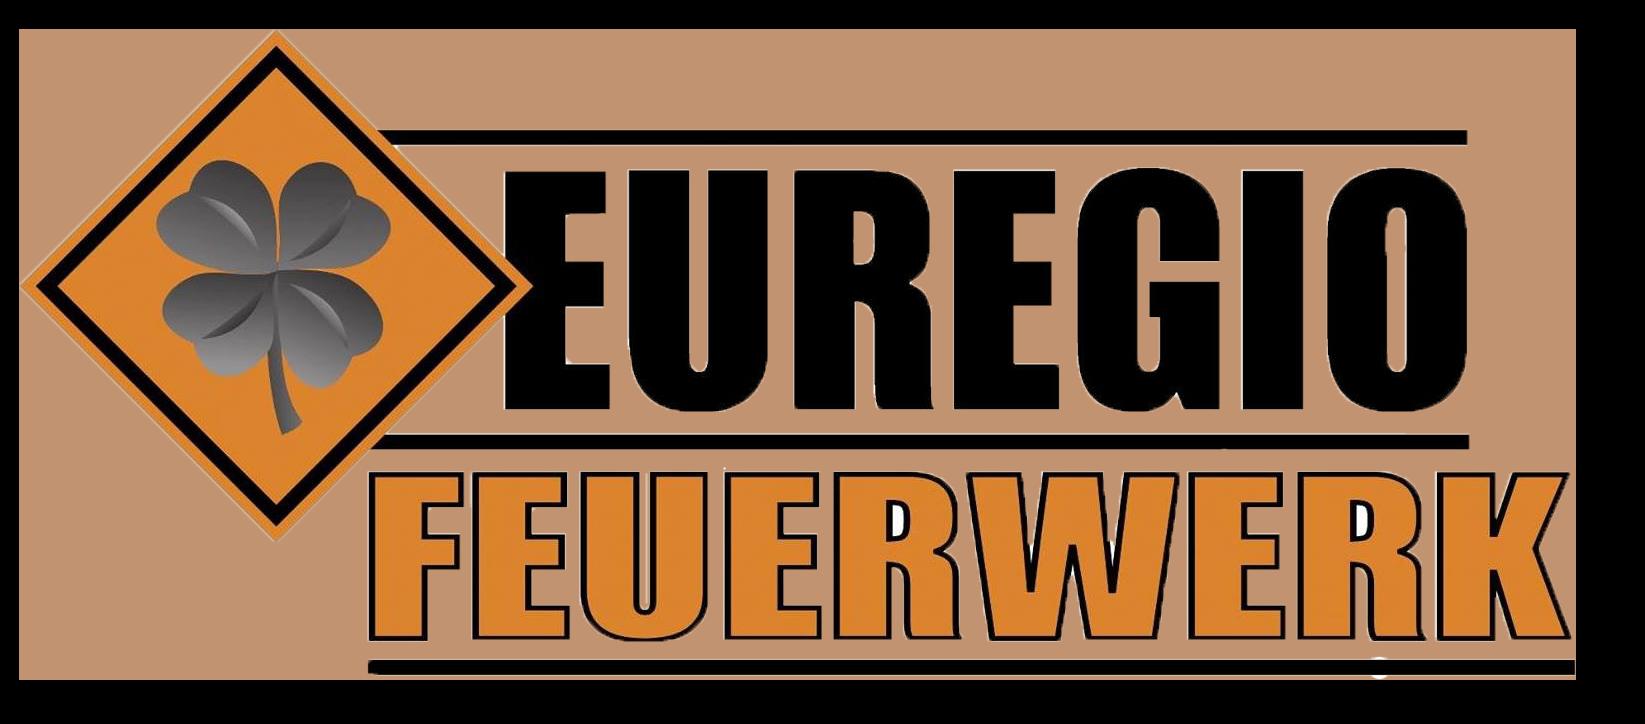 Euregio Feuerwerk